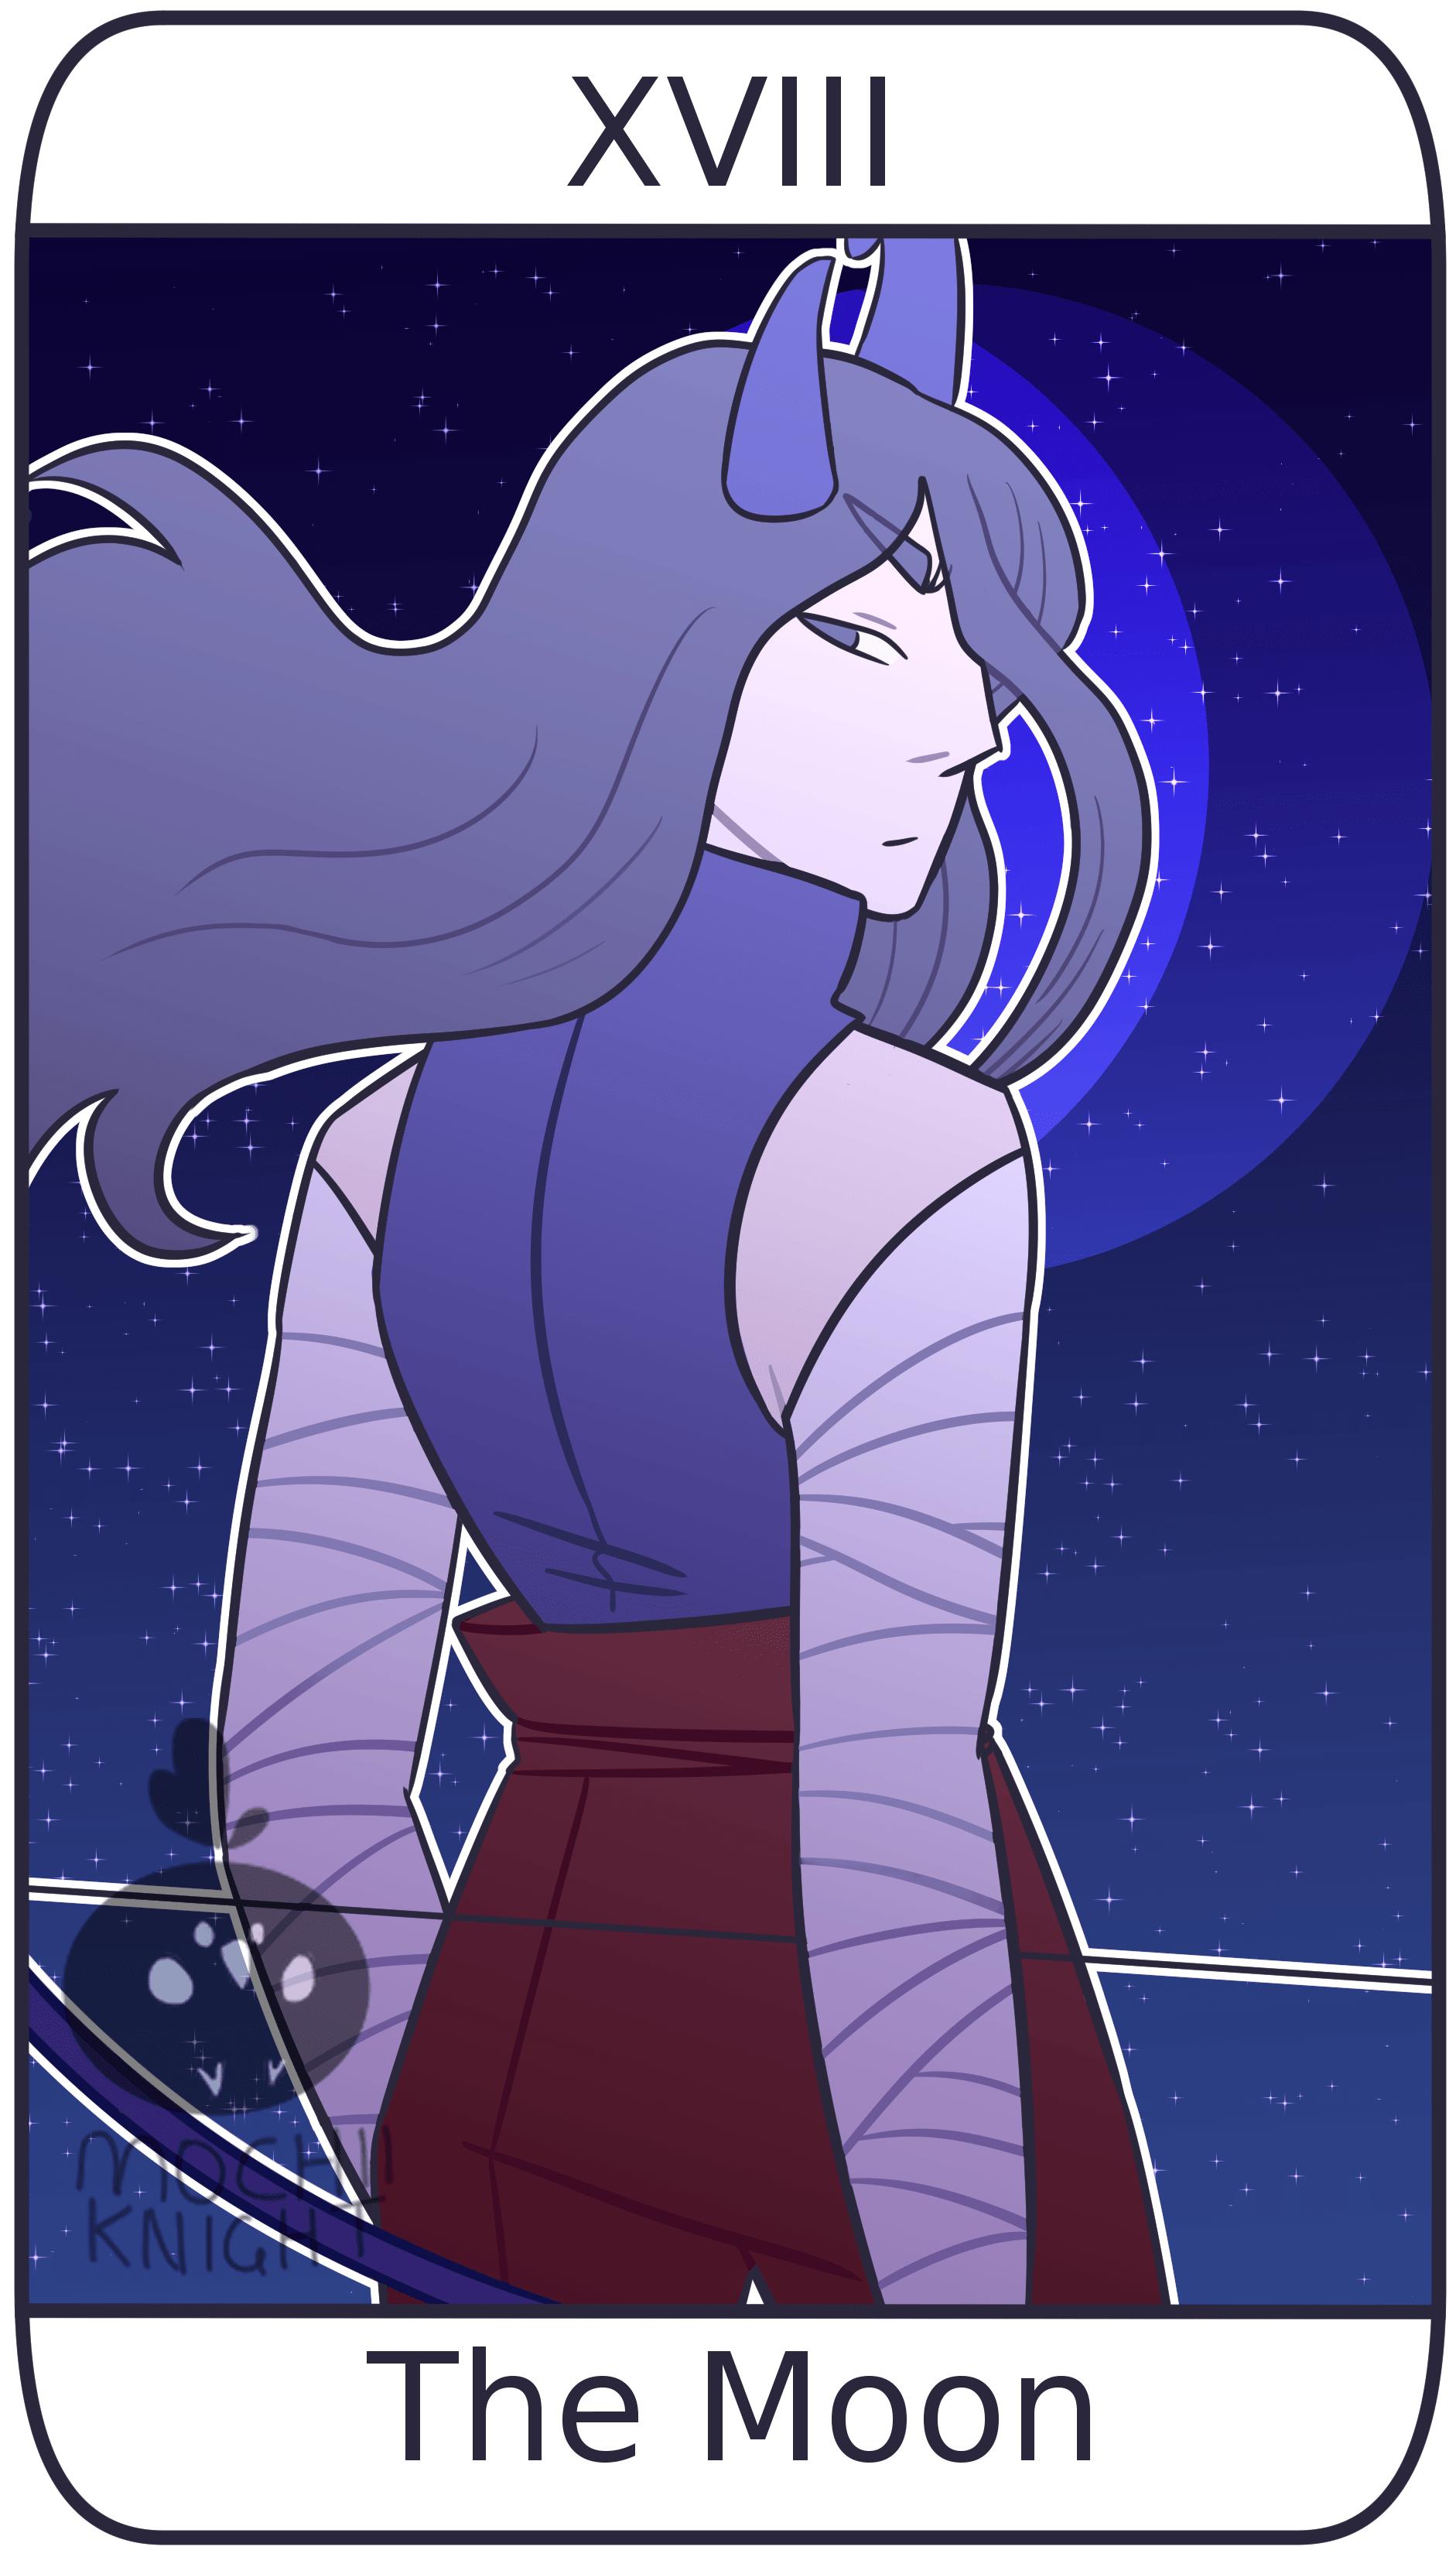 17 The Moon